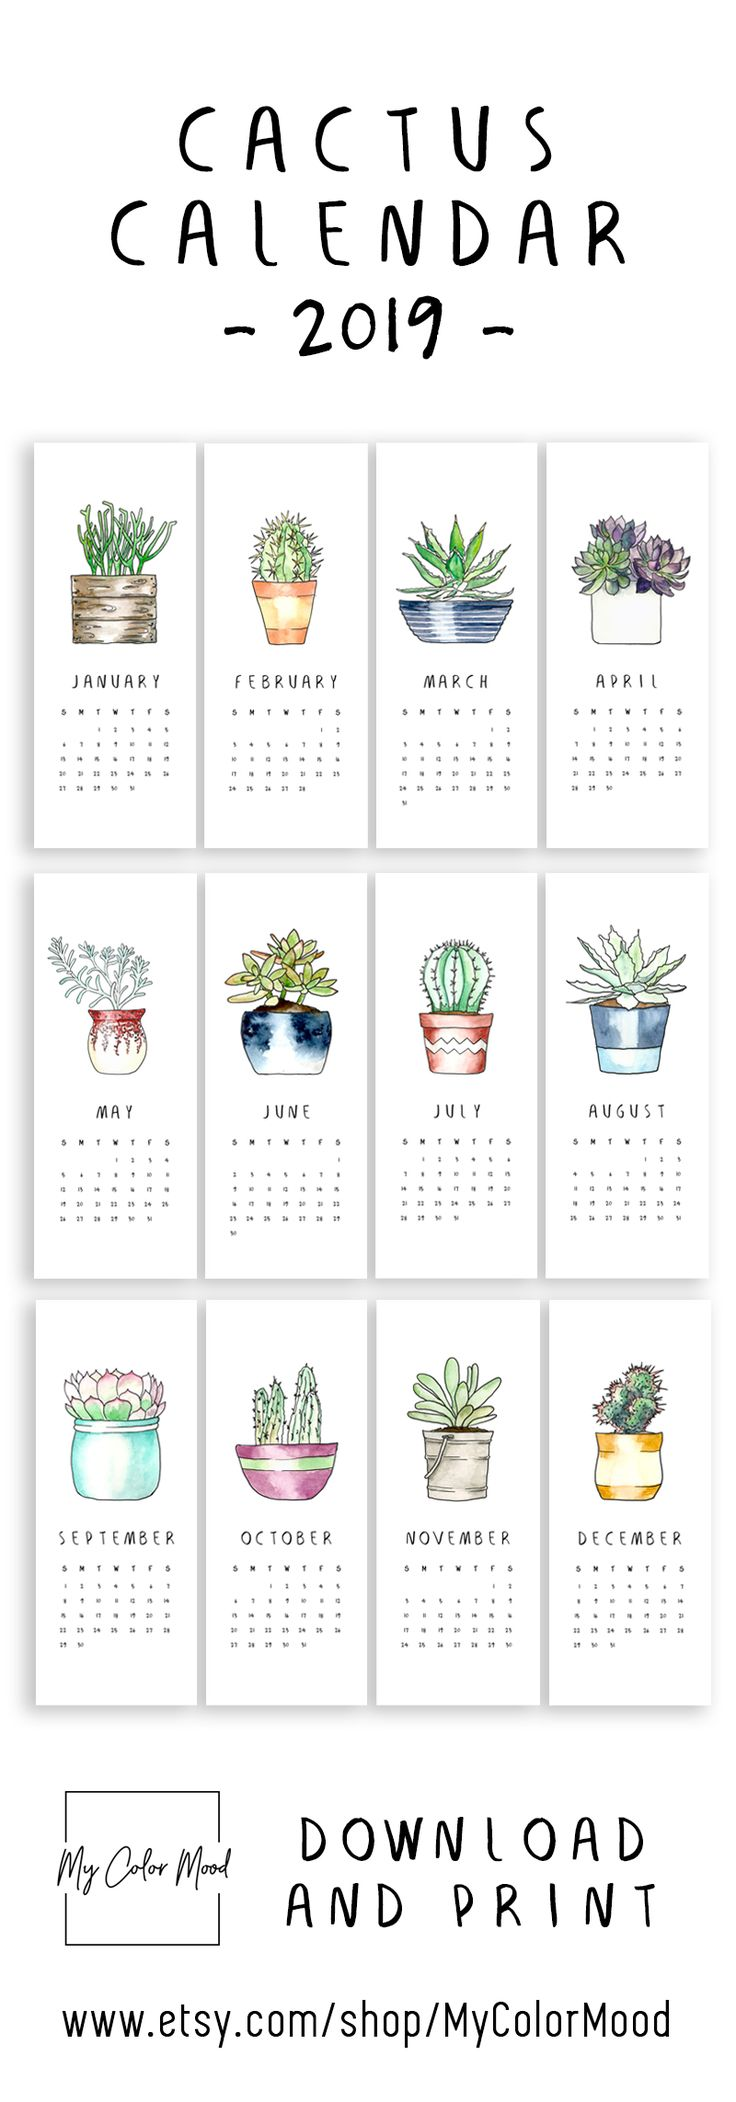 printable calendar pages 2019  small monthly calendar 2019 printable  hanging cactus calendar